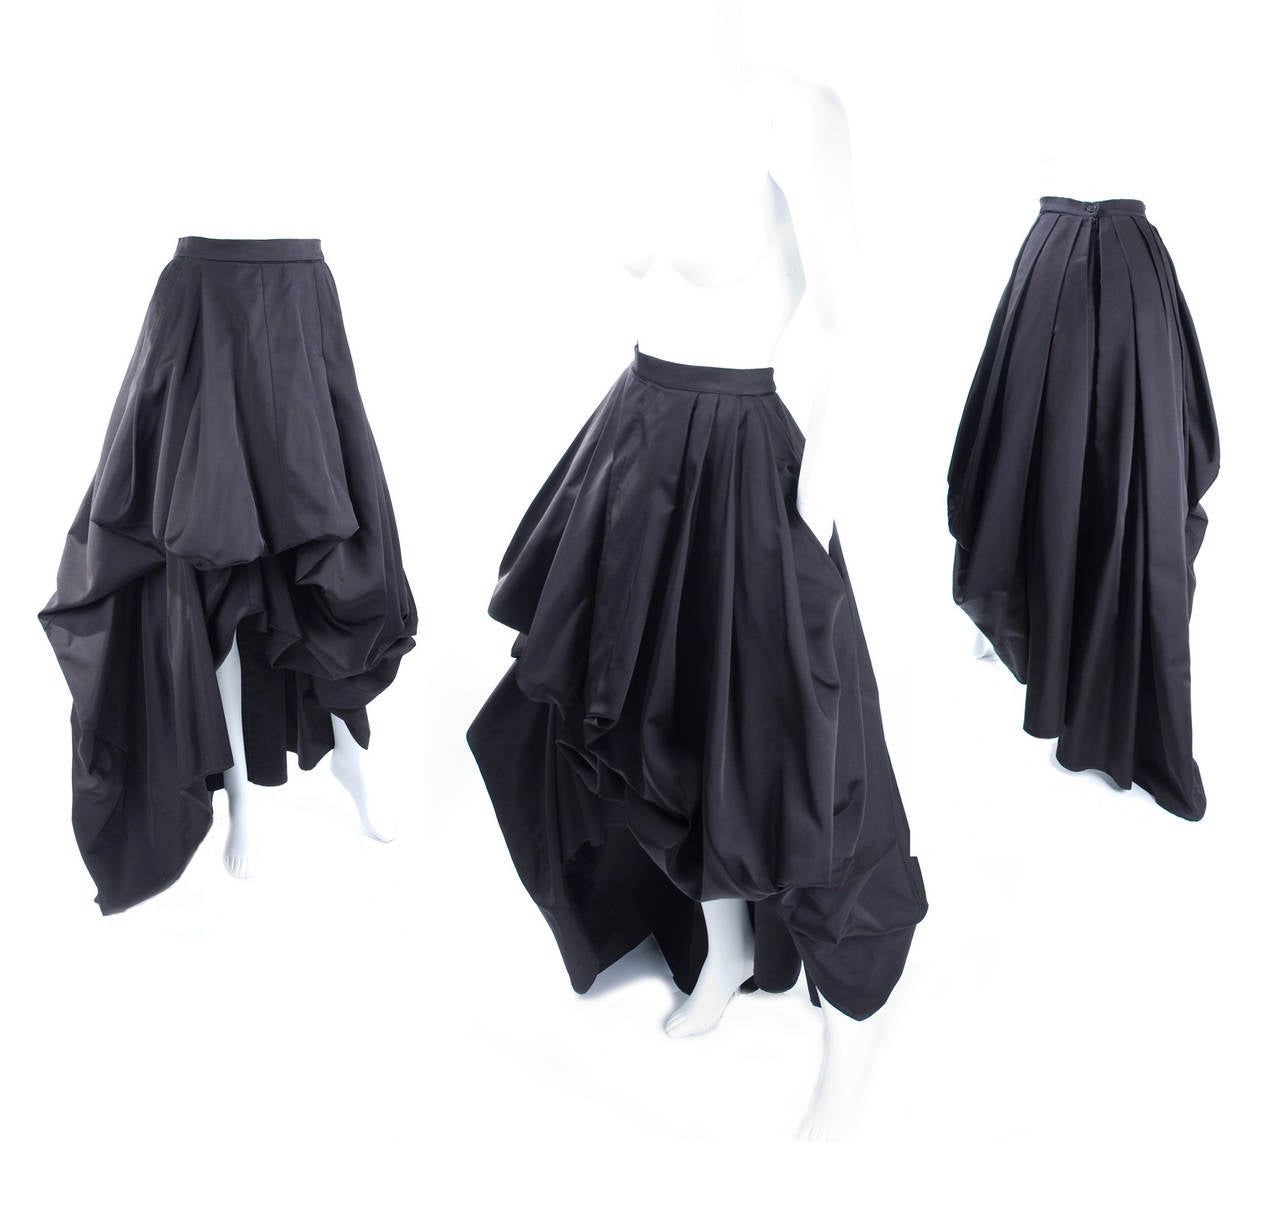 Rare Vintage HERMES Asymetrical Evening Skirt in Black Silk 2